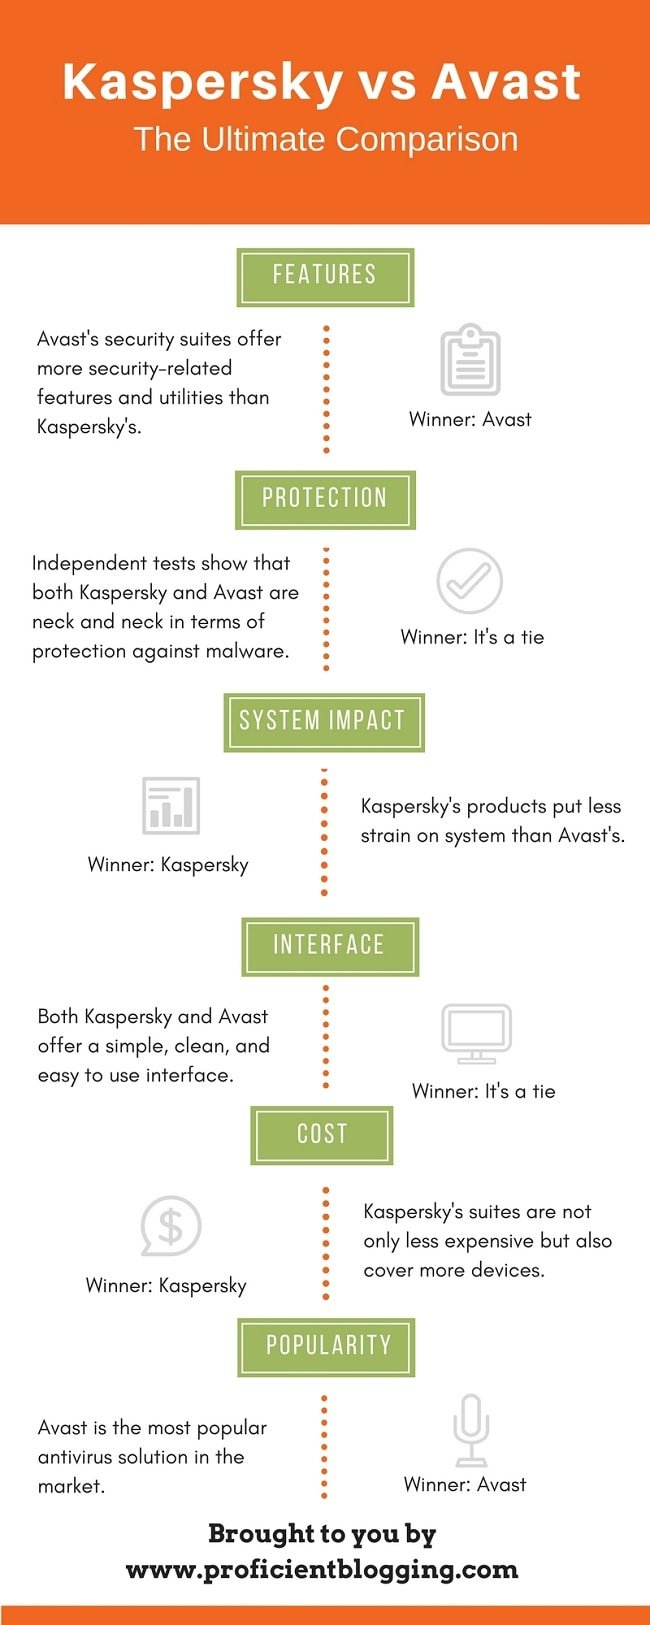 Kaspersky vs Avast Comparison Infographic